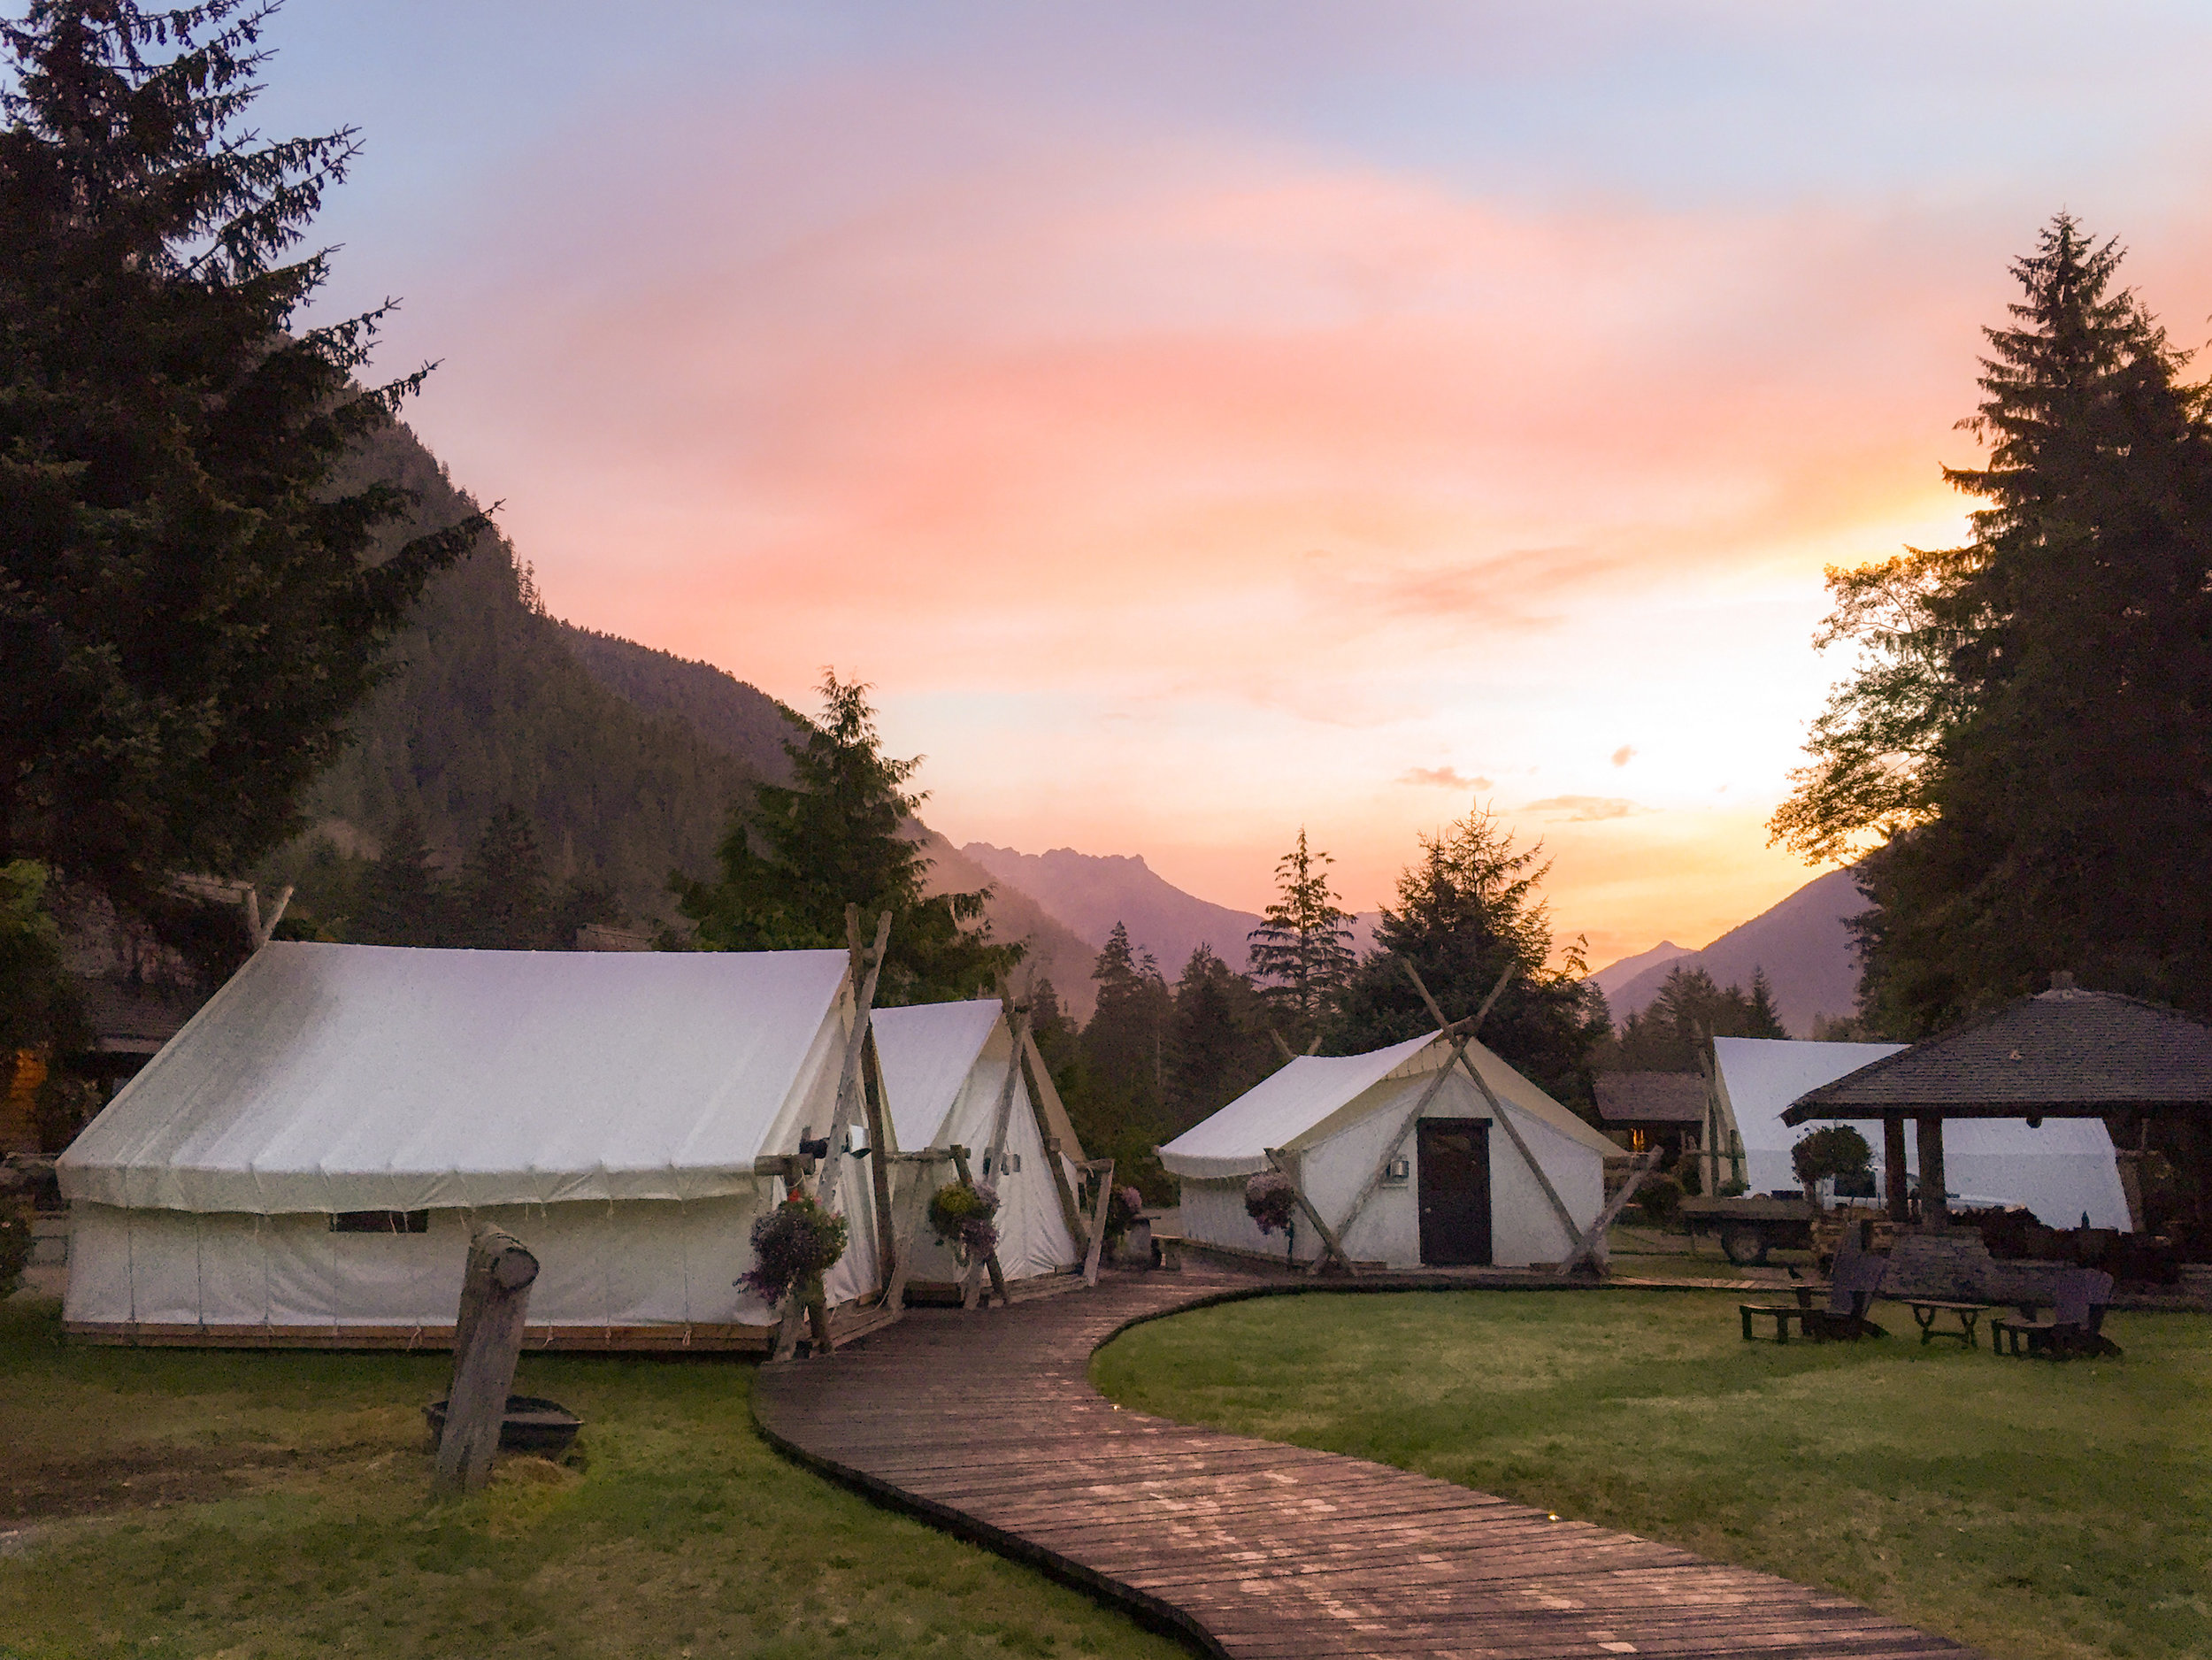 Dawn over the resort tents – Source Claudia Laroye